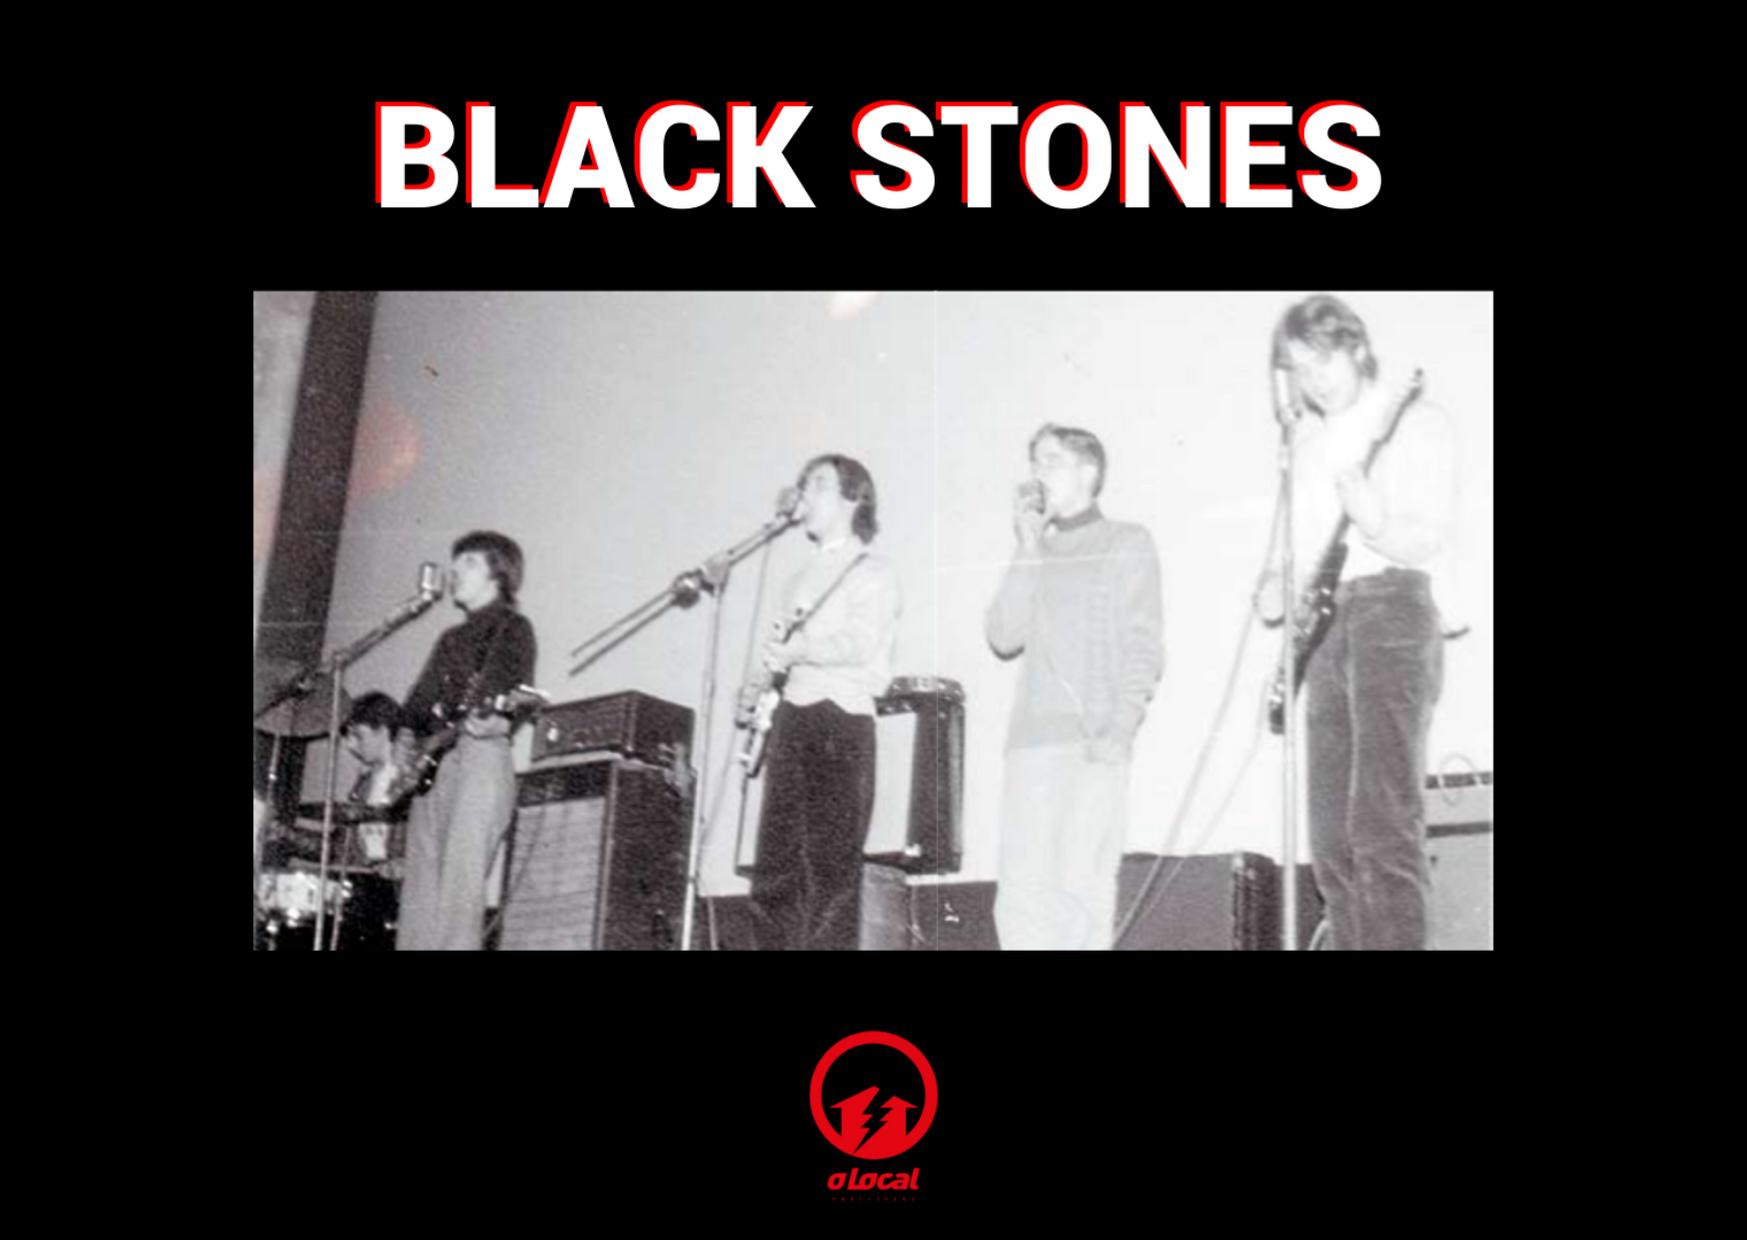 CLASE DE HISTORIA 13: BLACK STONES